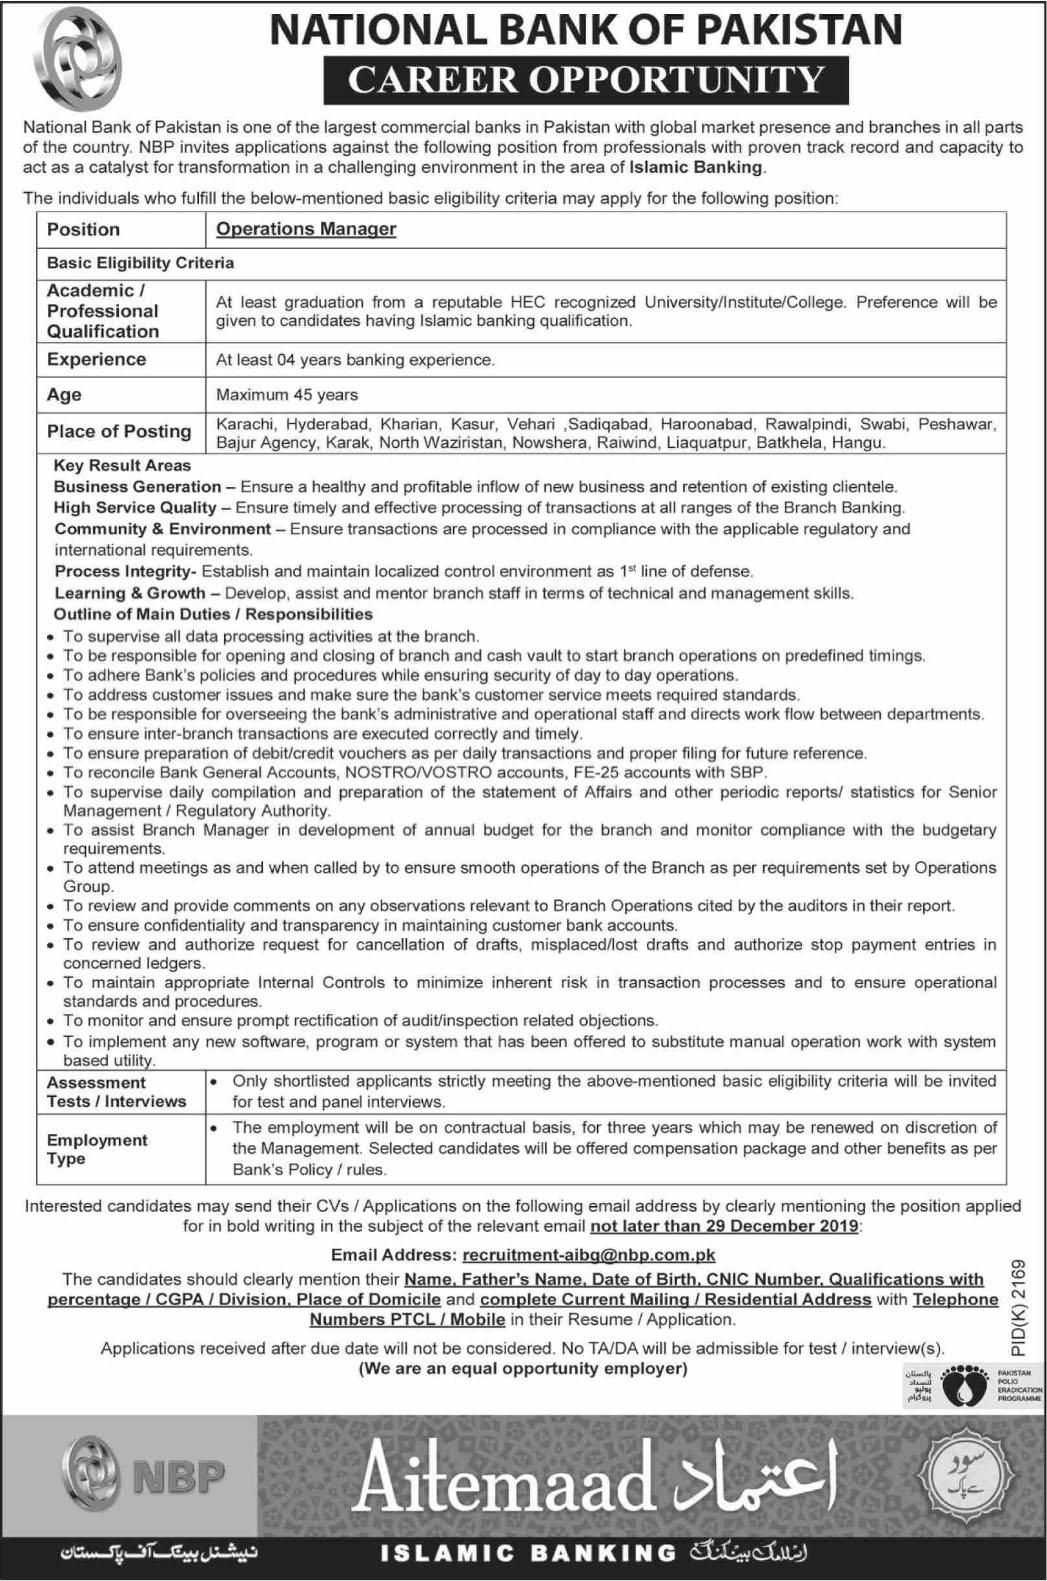 Jobs in National Bank of Pakistan